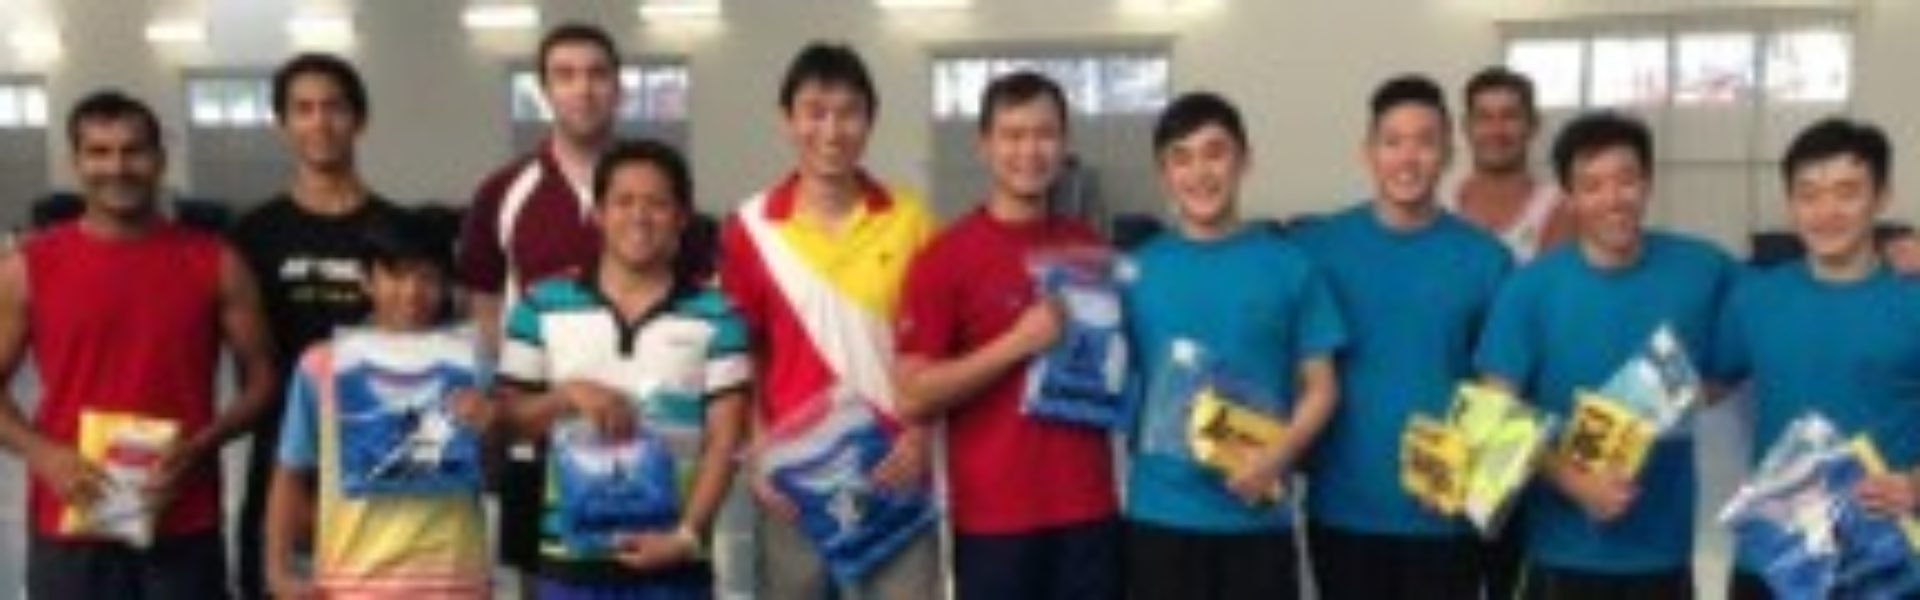 Sunnybank Hills Badminton Club